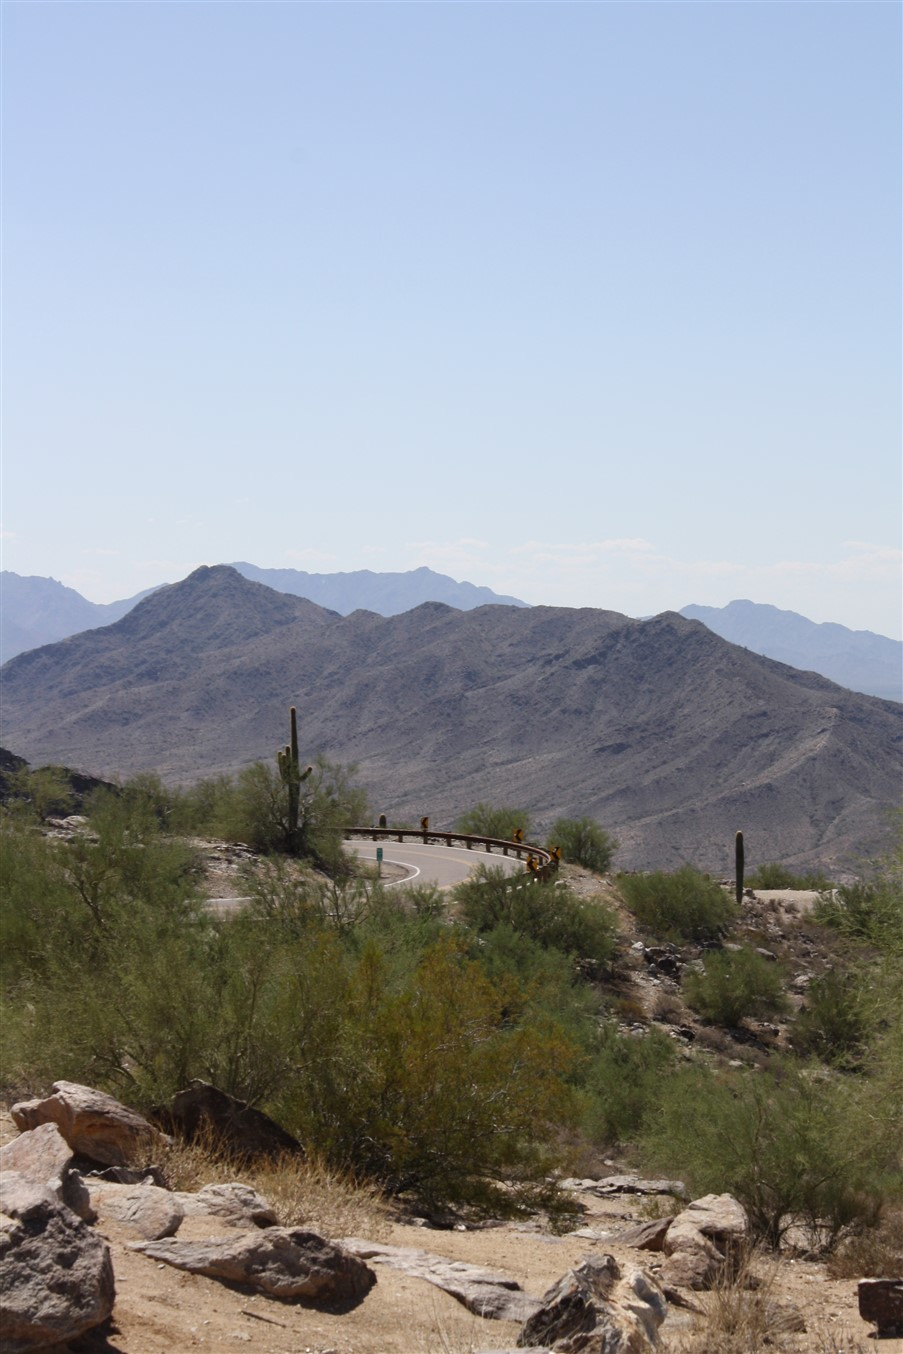 2009 08 26 49 Phoenix South Mountain.jpg